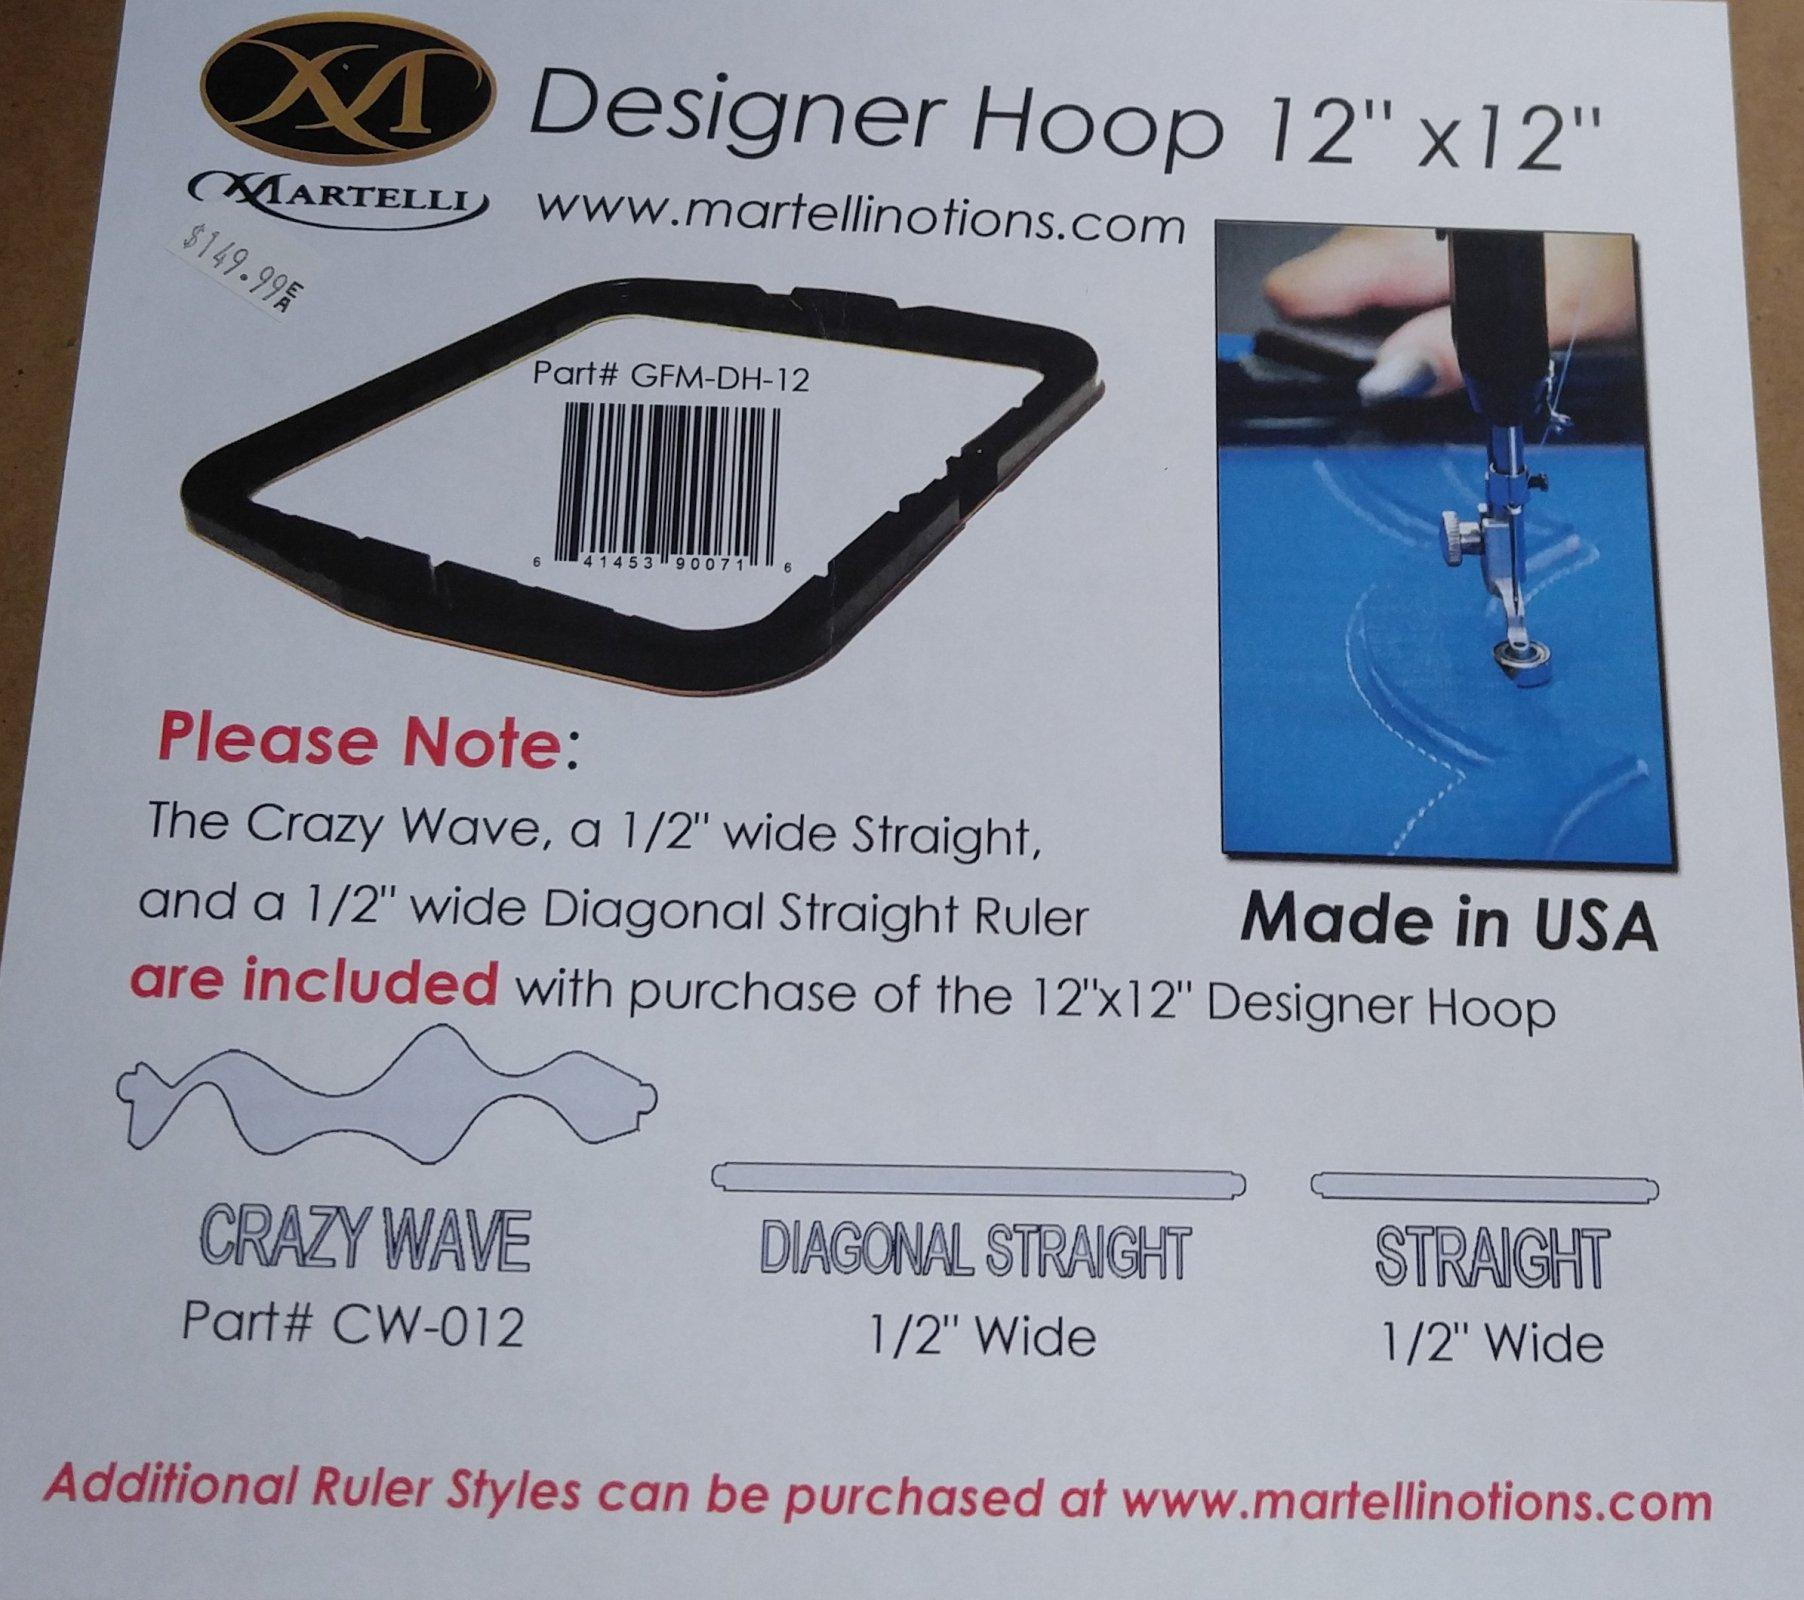 Martelli Designer Hoop 12x12 plus 3 rulers